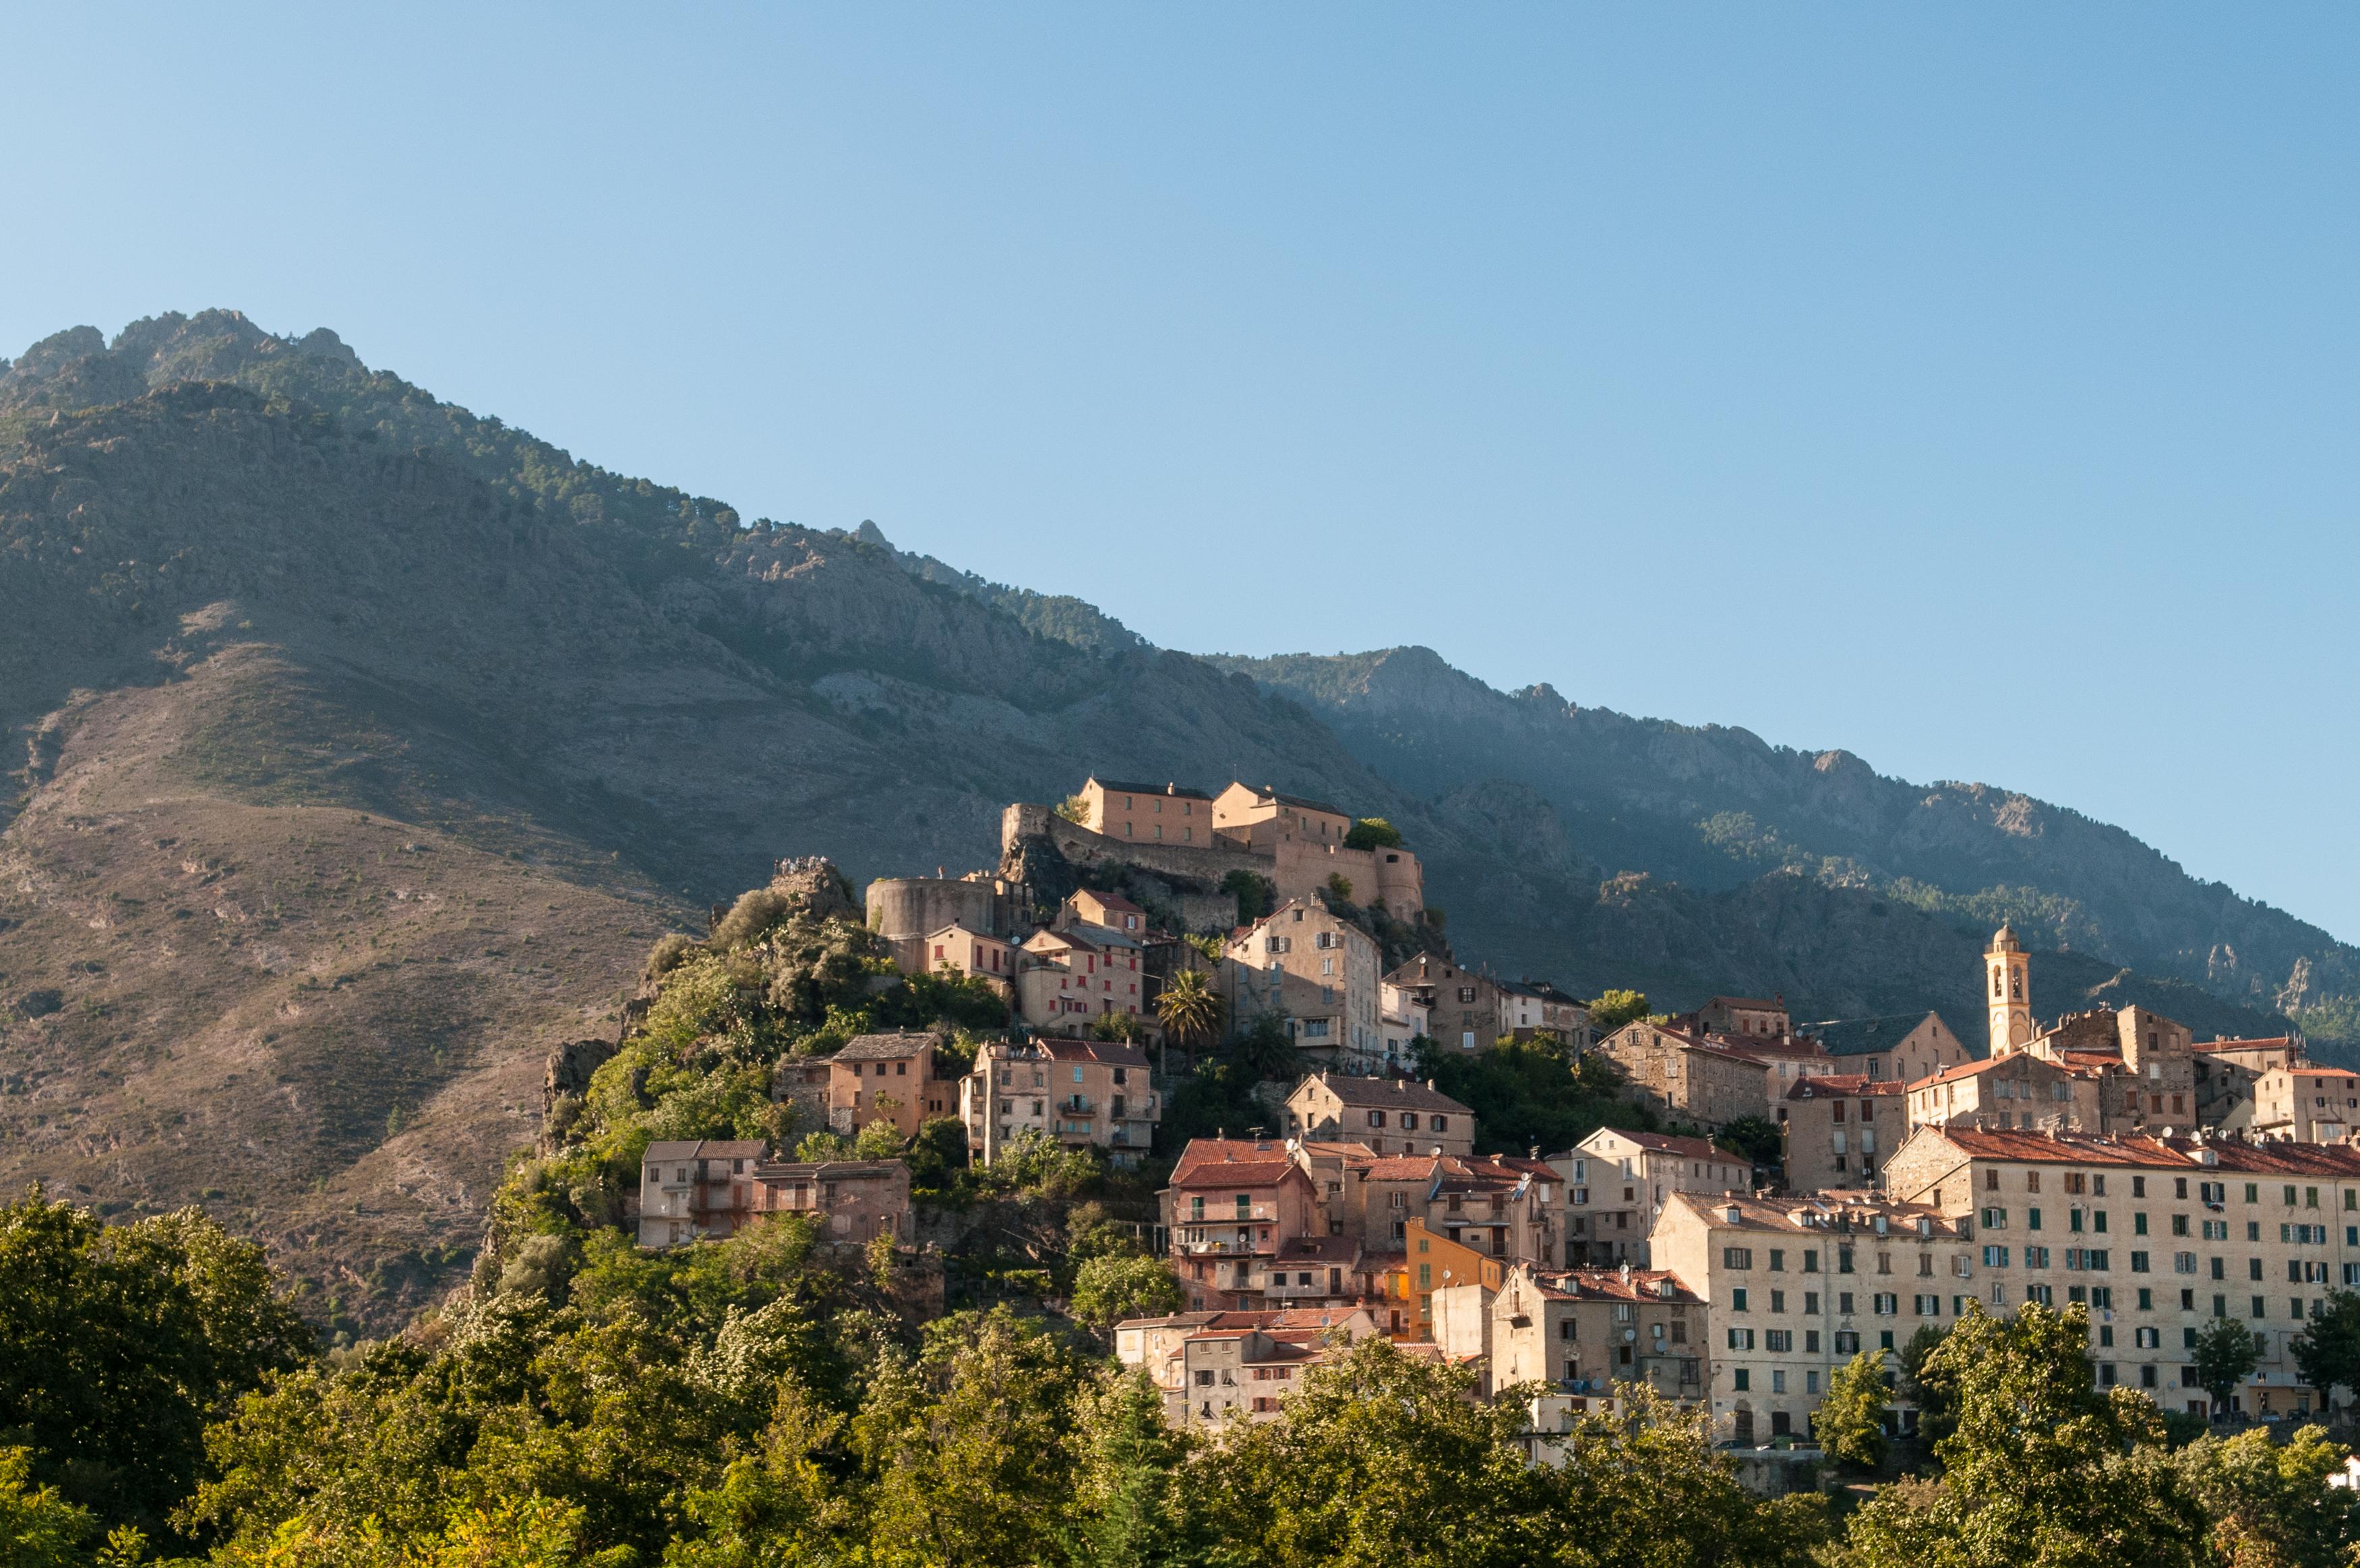 Free Silhouette Images File Corte Corsica 8132723589 Jpg